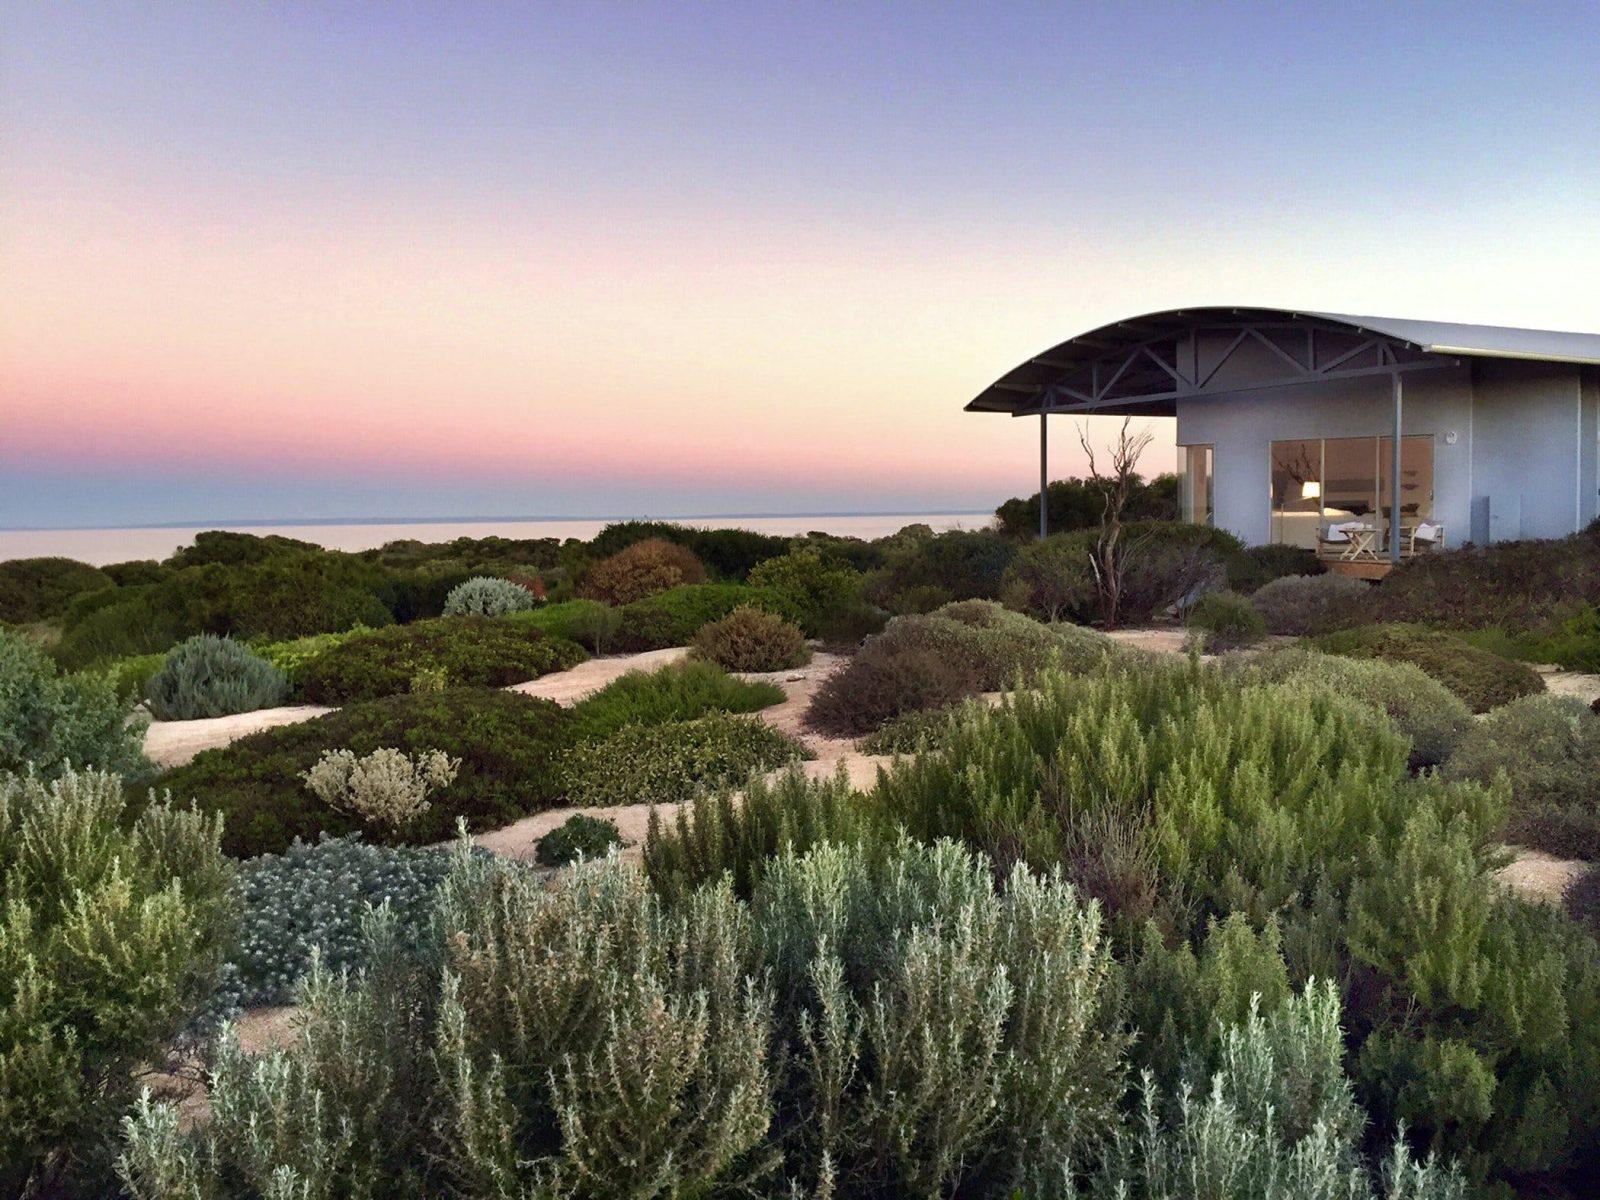 Yondah Beach House on beautiful Yorke Peninsula in South Australia